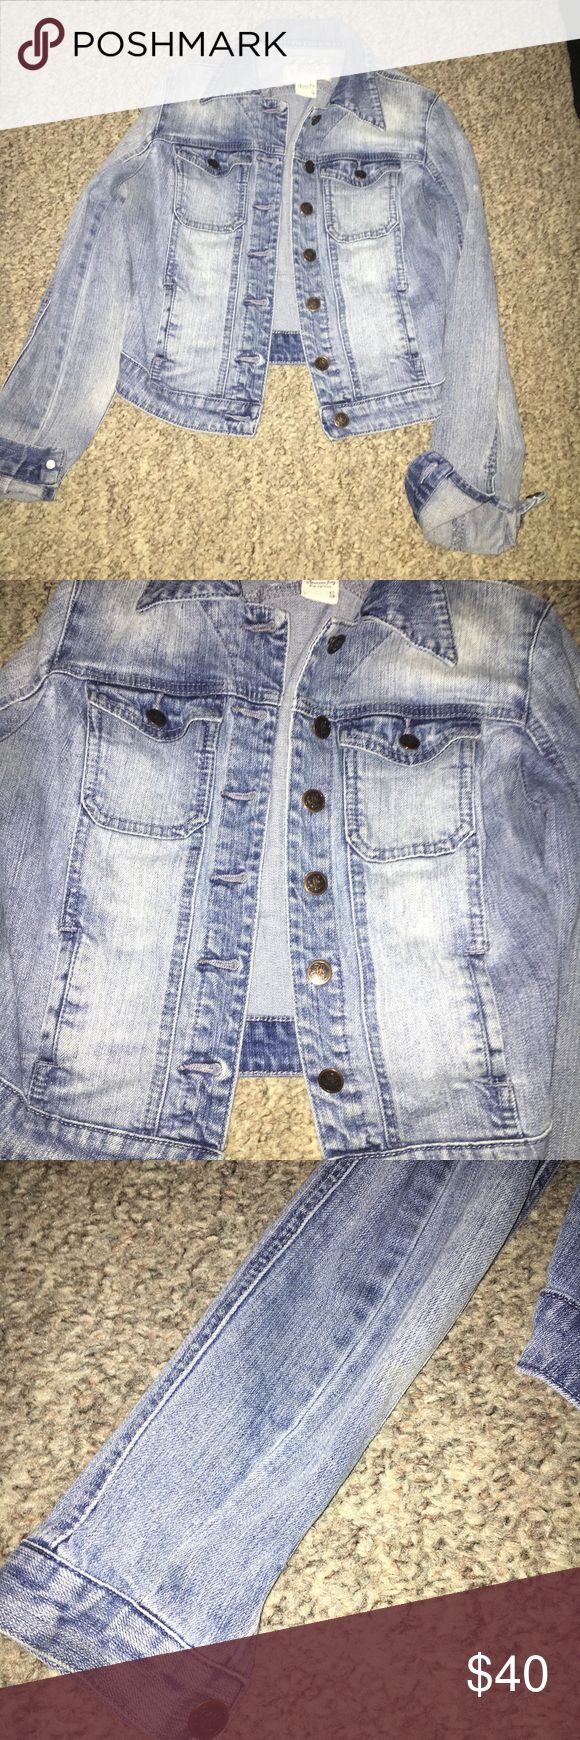 American rag denim jacket Great condition American rag denim jacket size small wonderful for the fall American Rag Jackets & Coats